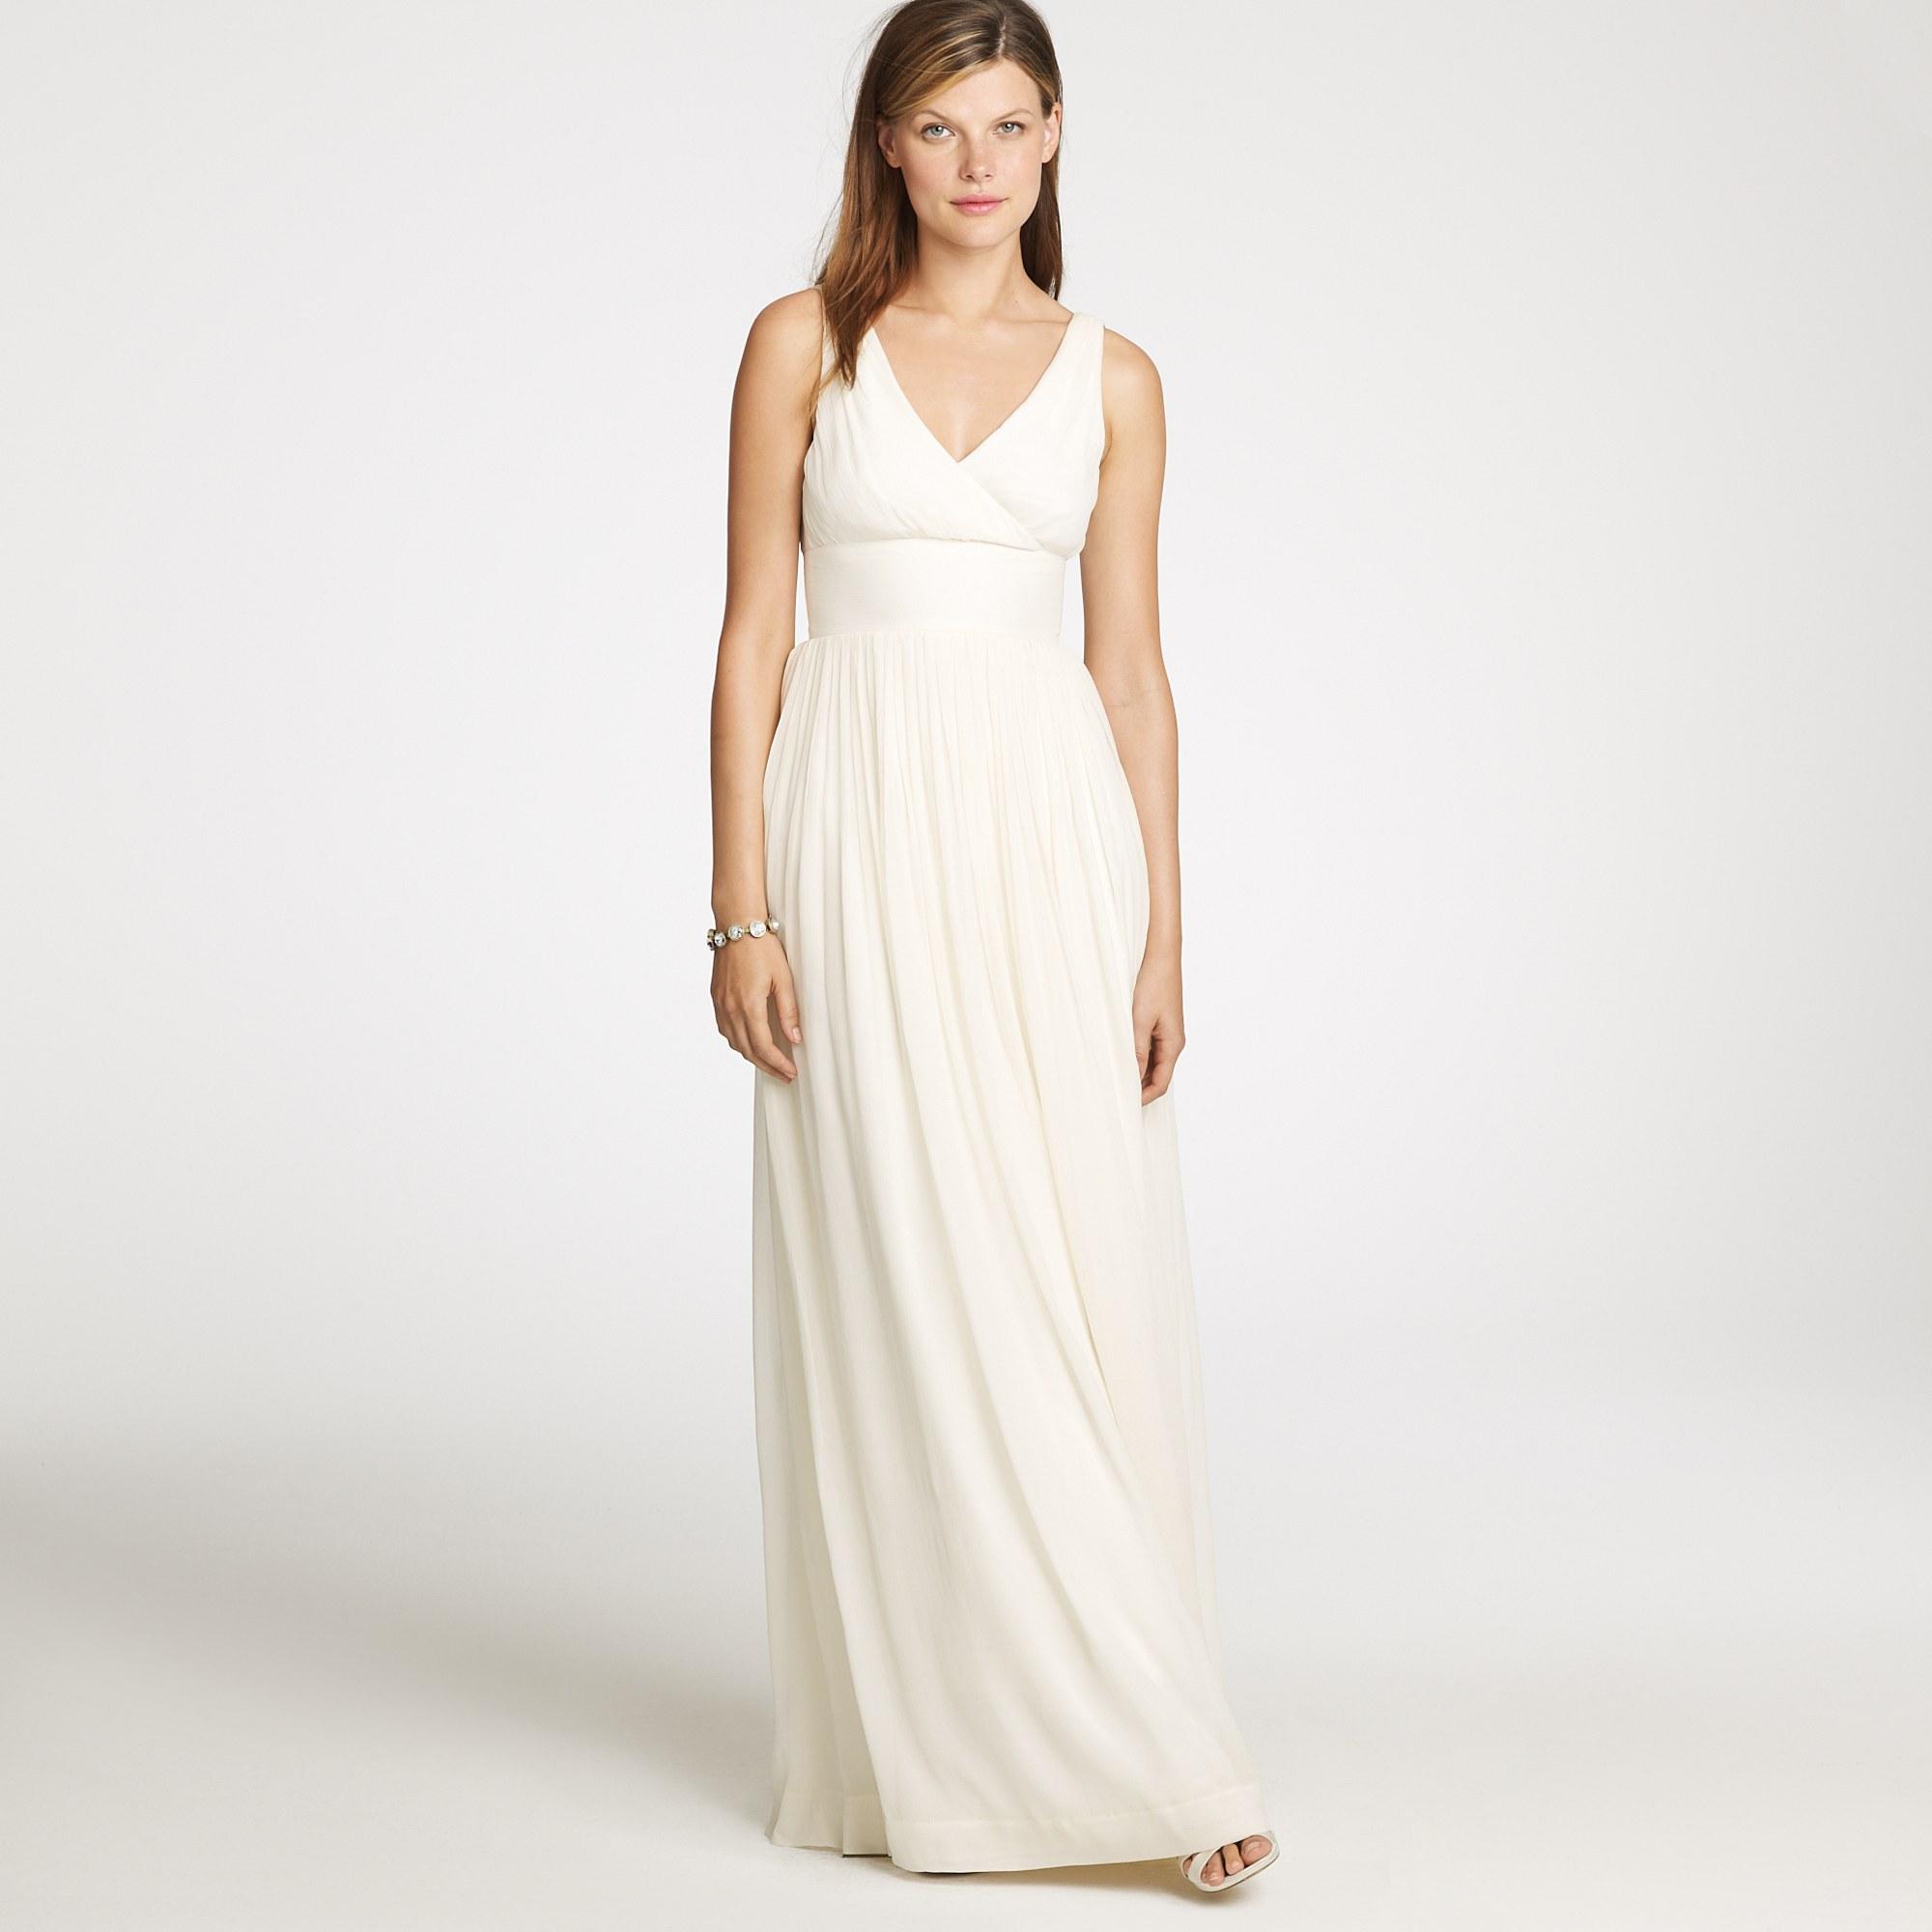 Jew sophia long dress in silk chiffon in white lyst gallery ombrellifo Choice Image